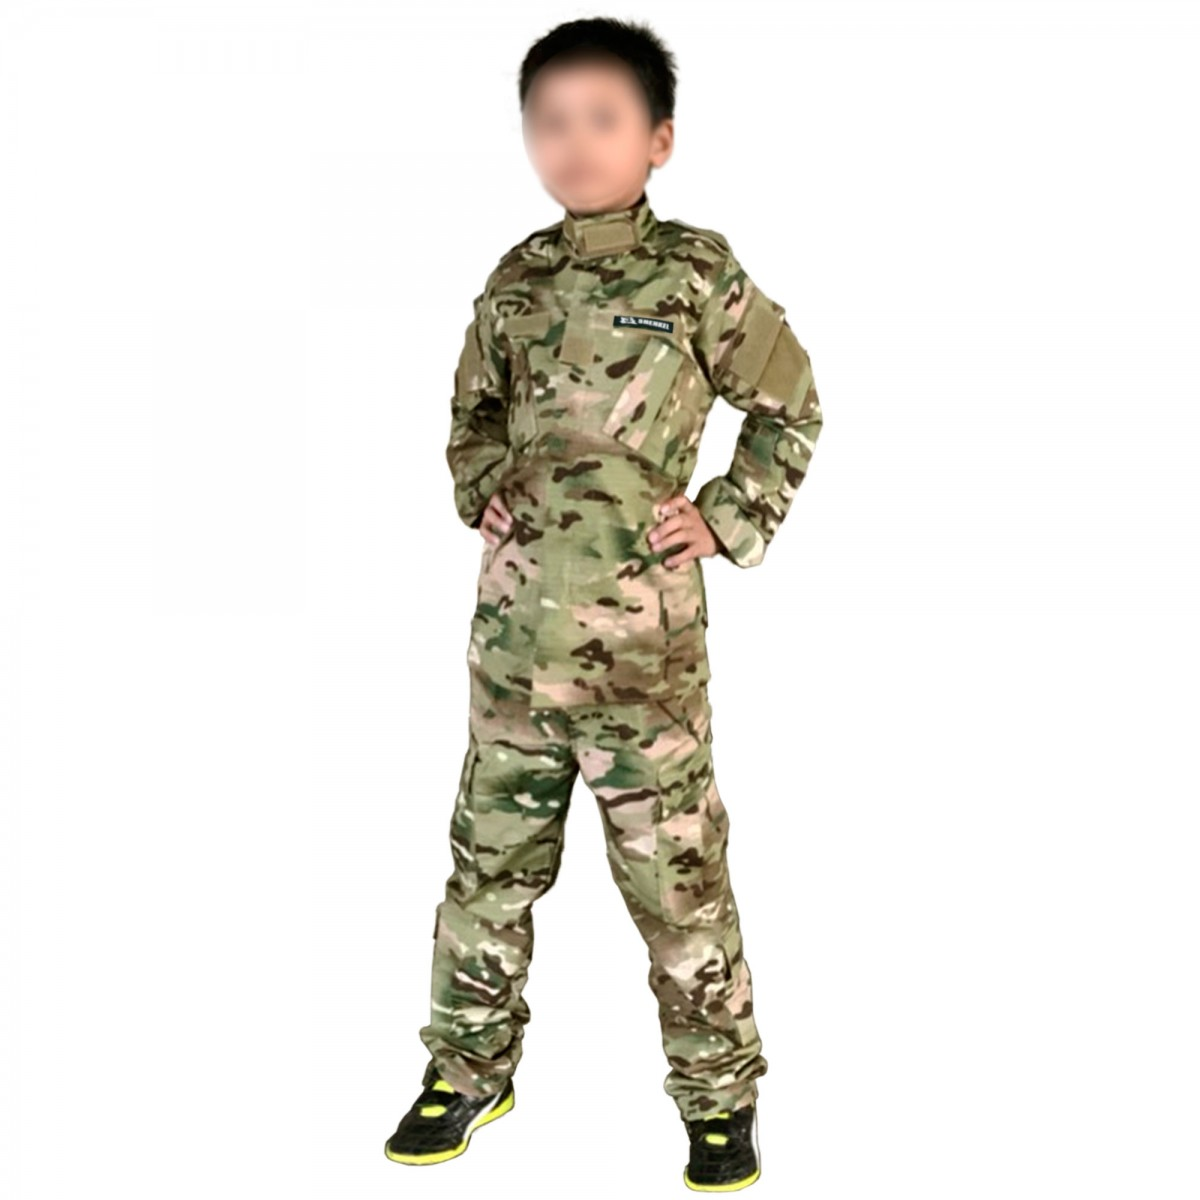 SHENKEL キッズ 迷彩服 上下セット 子供 (130cm) マルチカム 戦闘服 BDU 男の子 女の子 小さいサイズ ※適応身長130~140cm前後